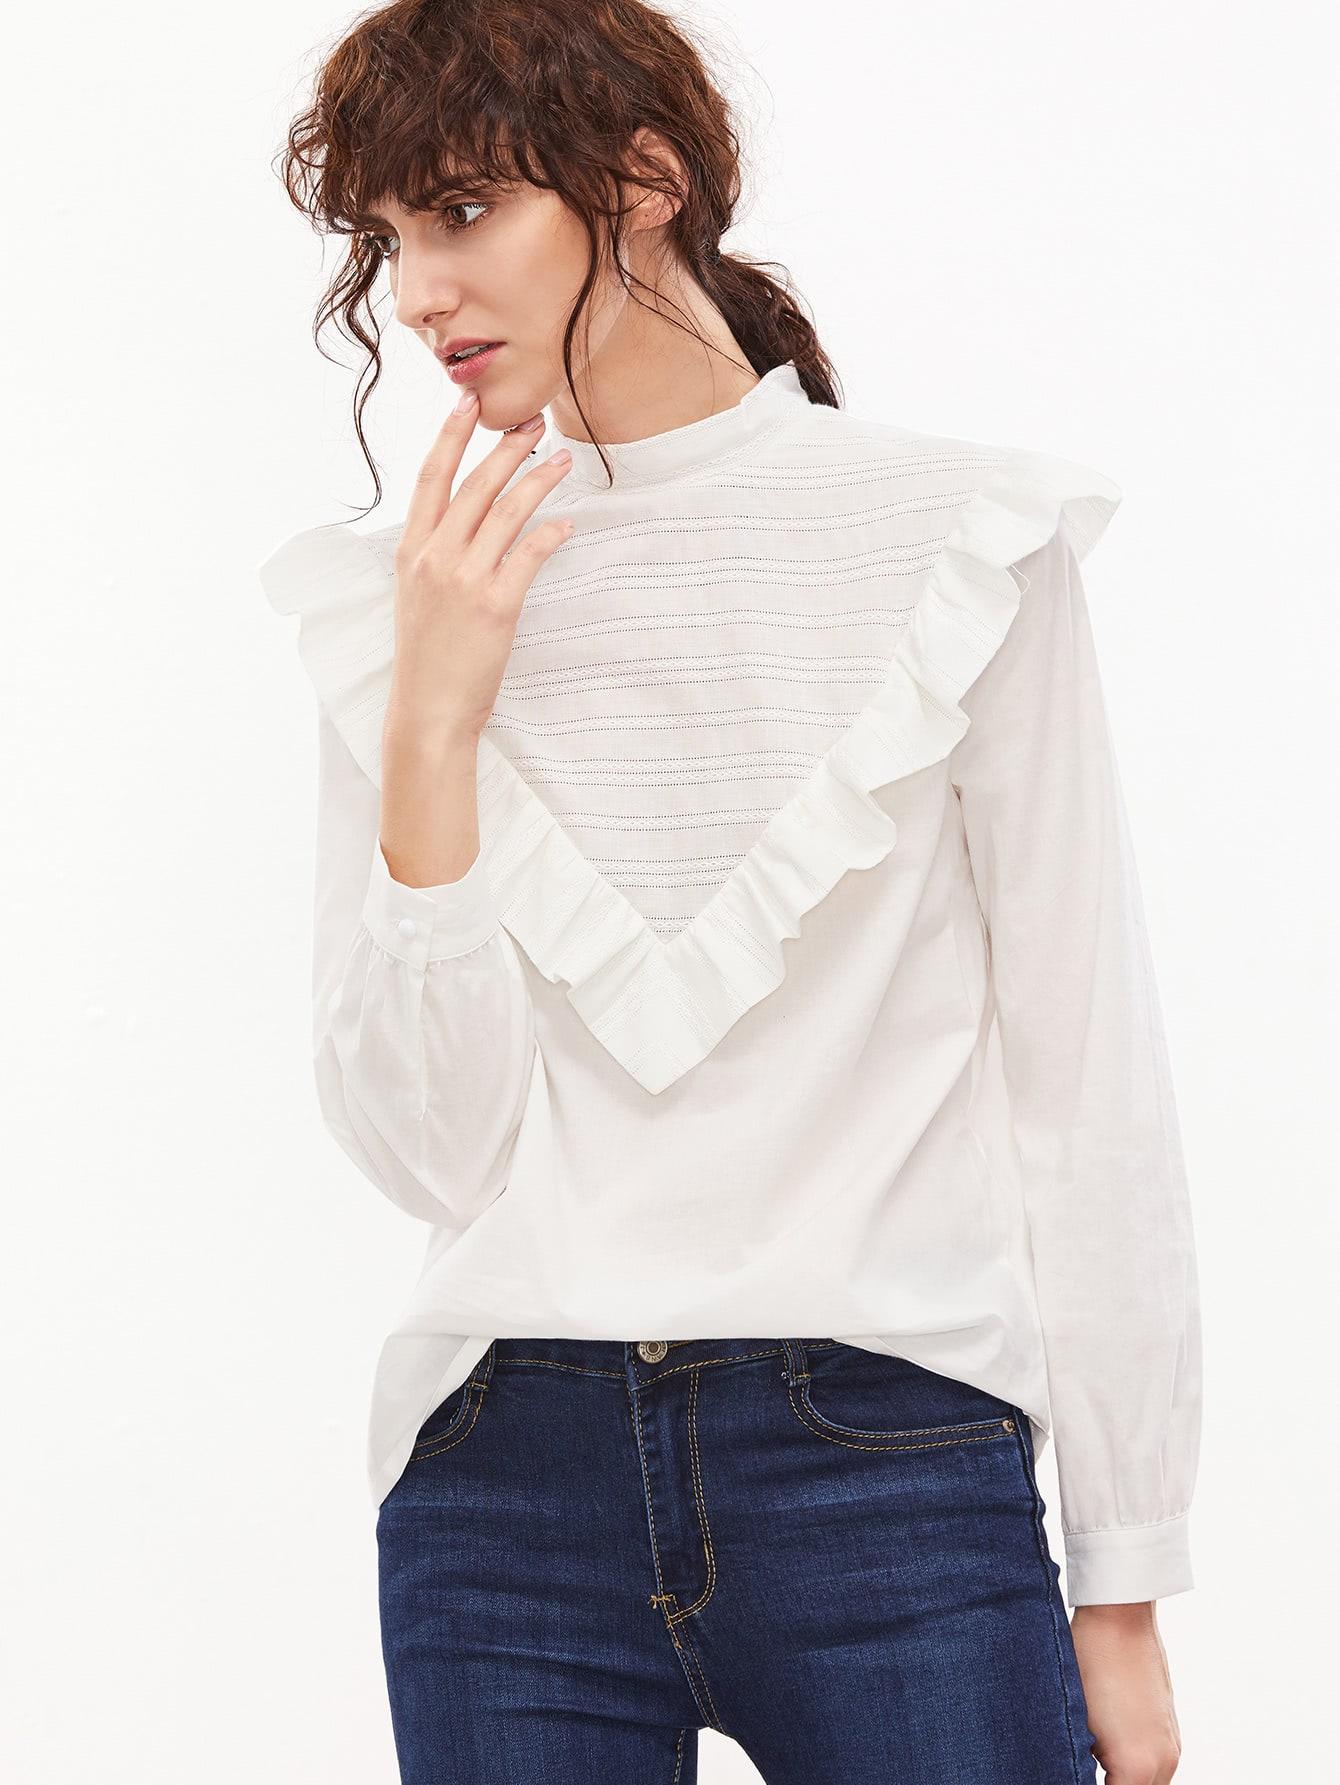 blouse161201703_2